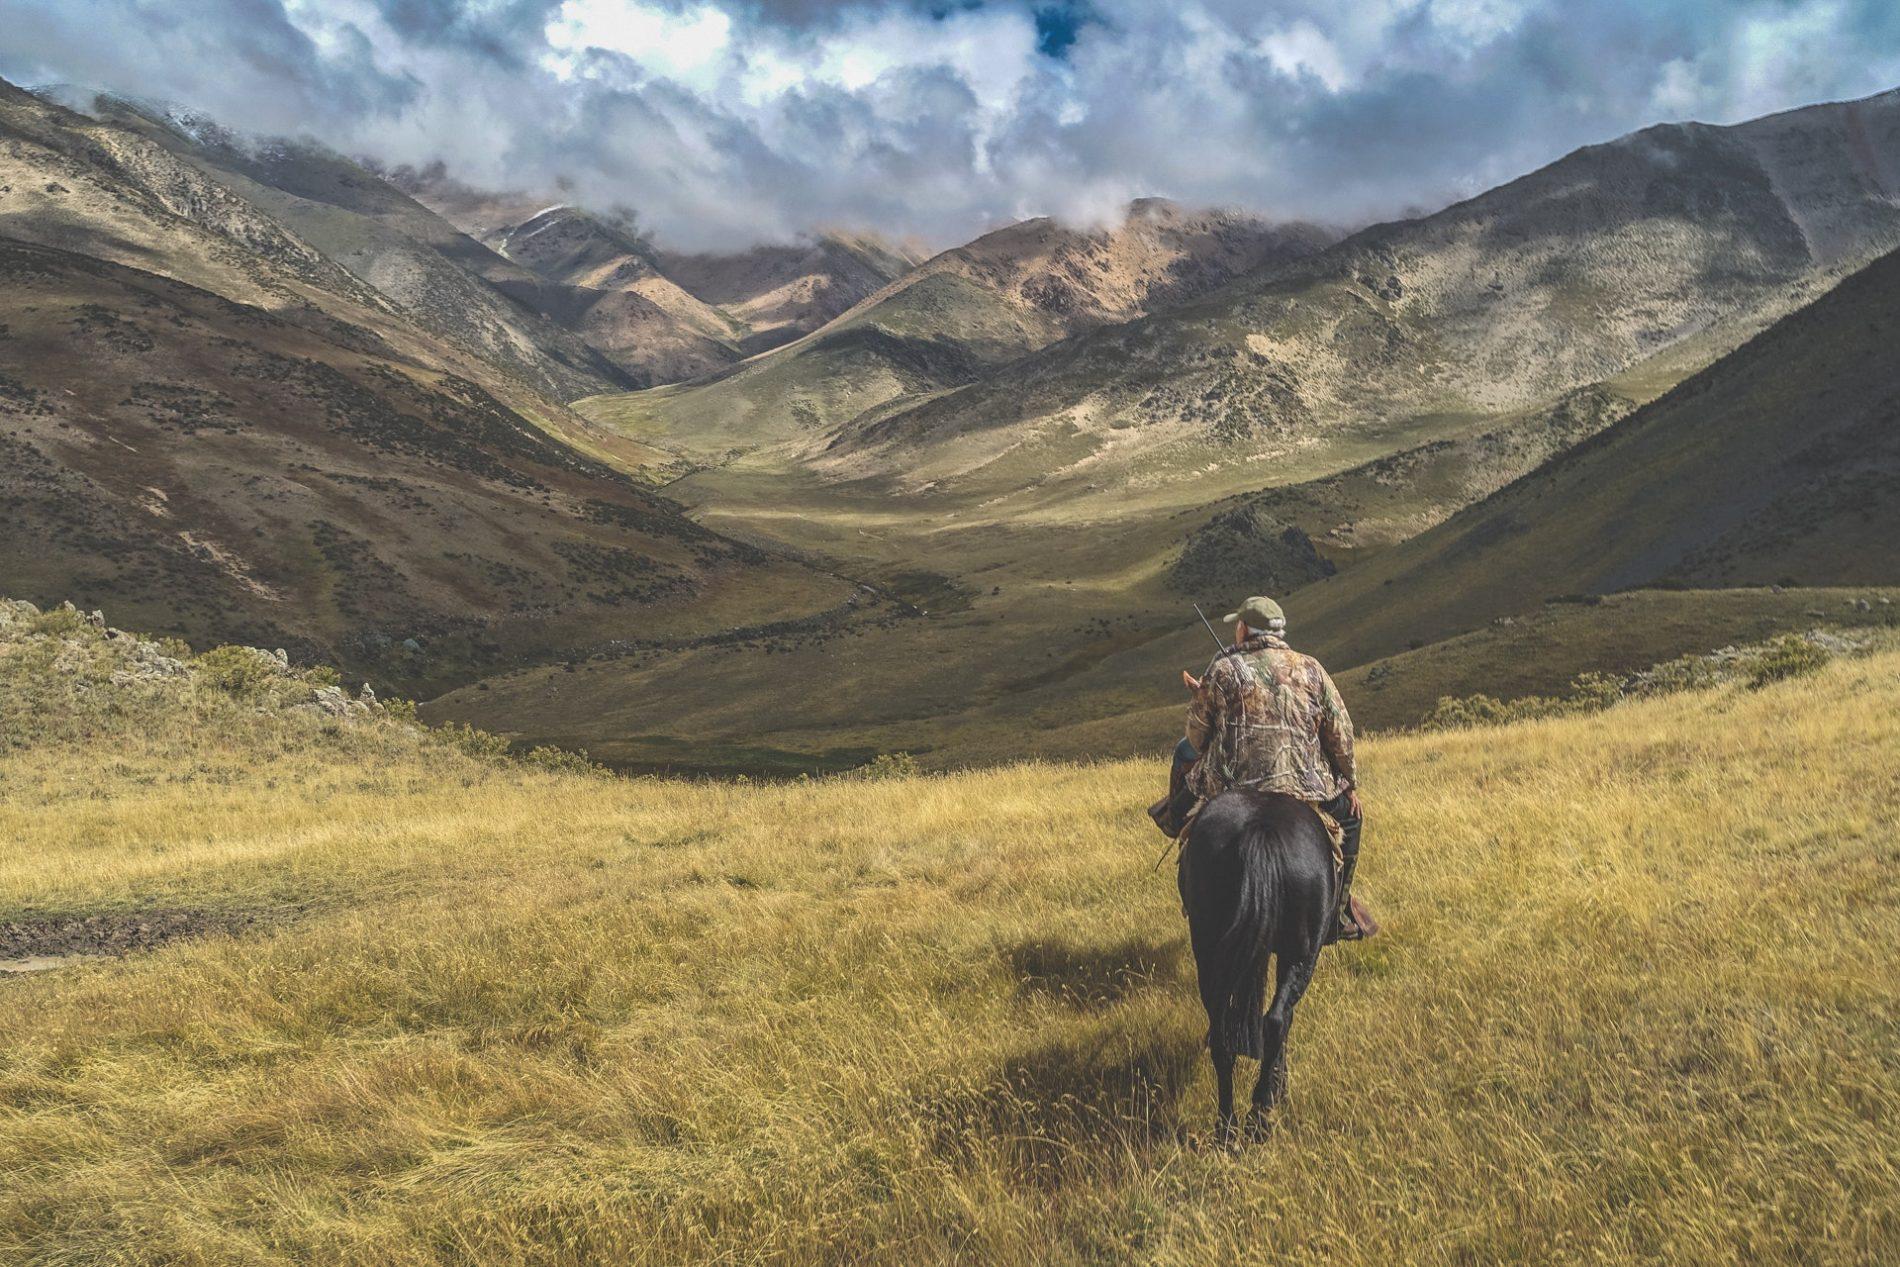 landscape - Talk for Writing